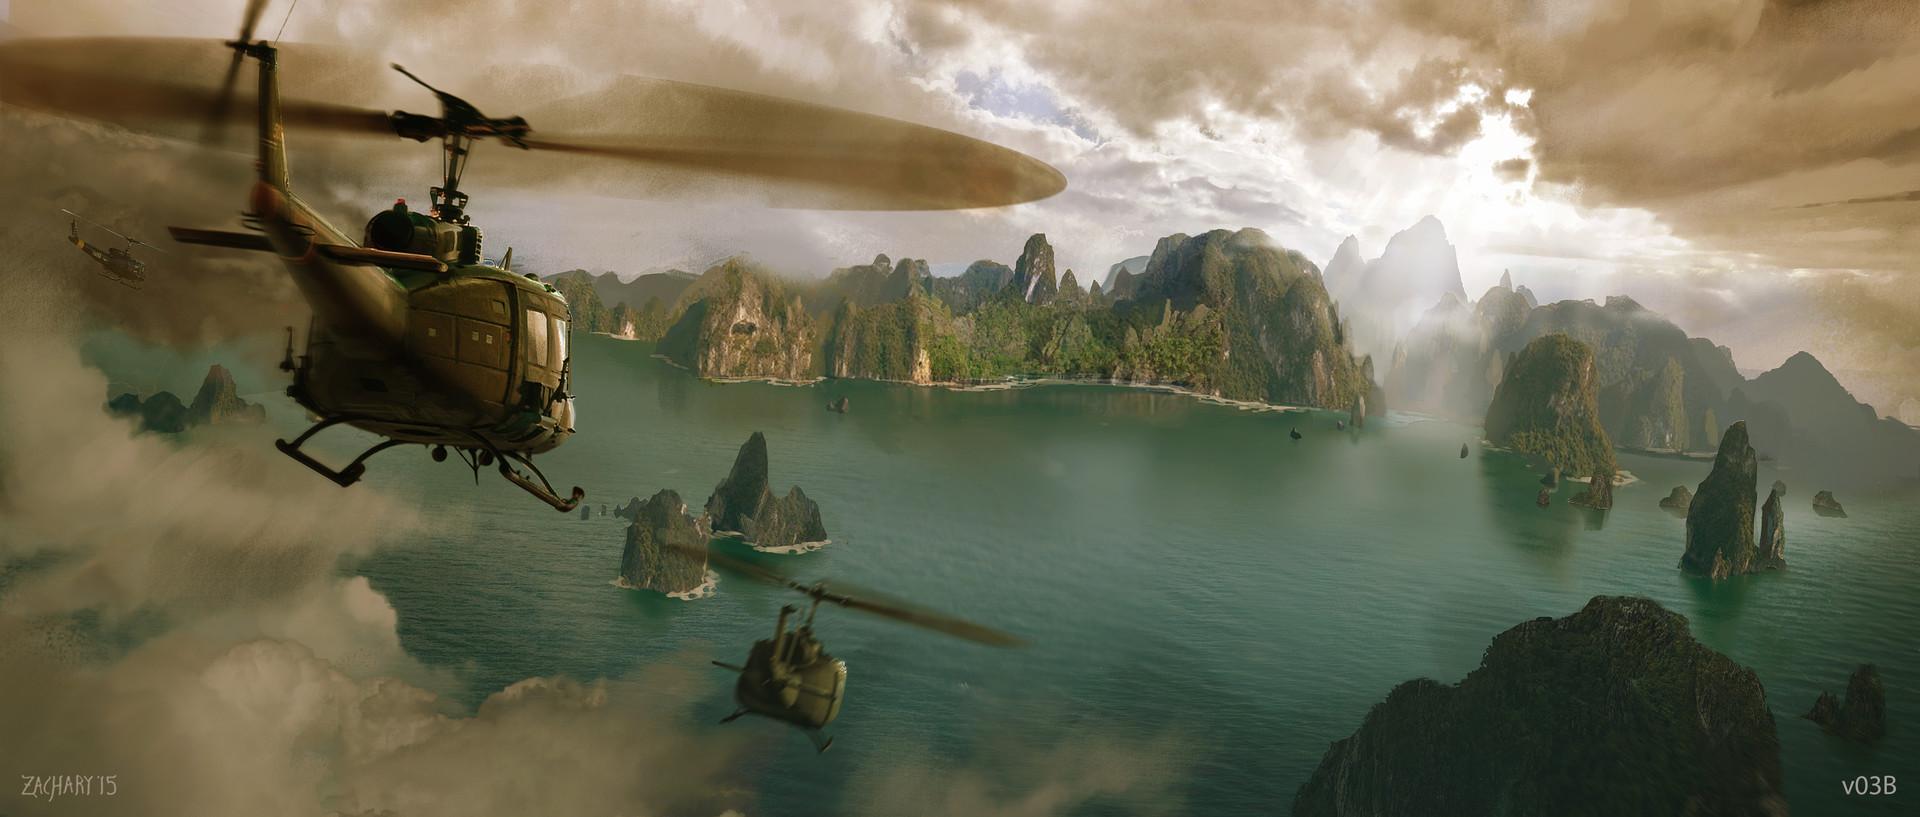 KONG VR: Destination Skull Island - YouTube